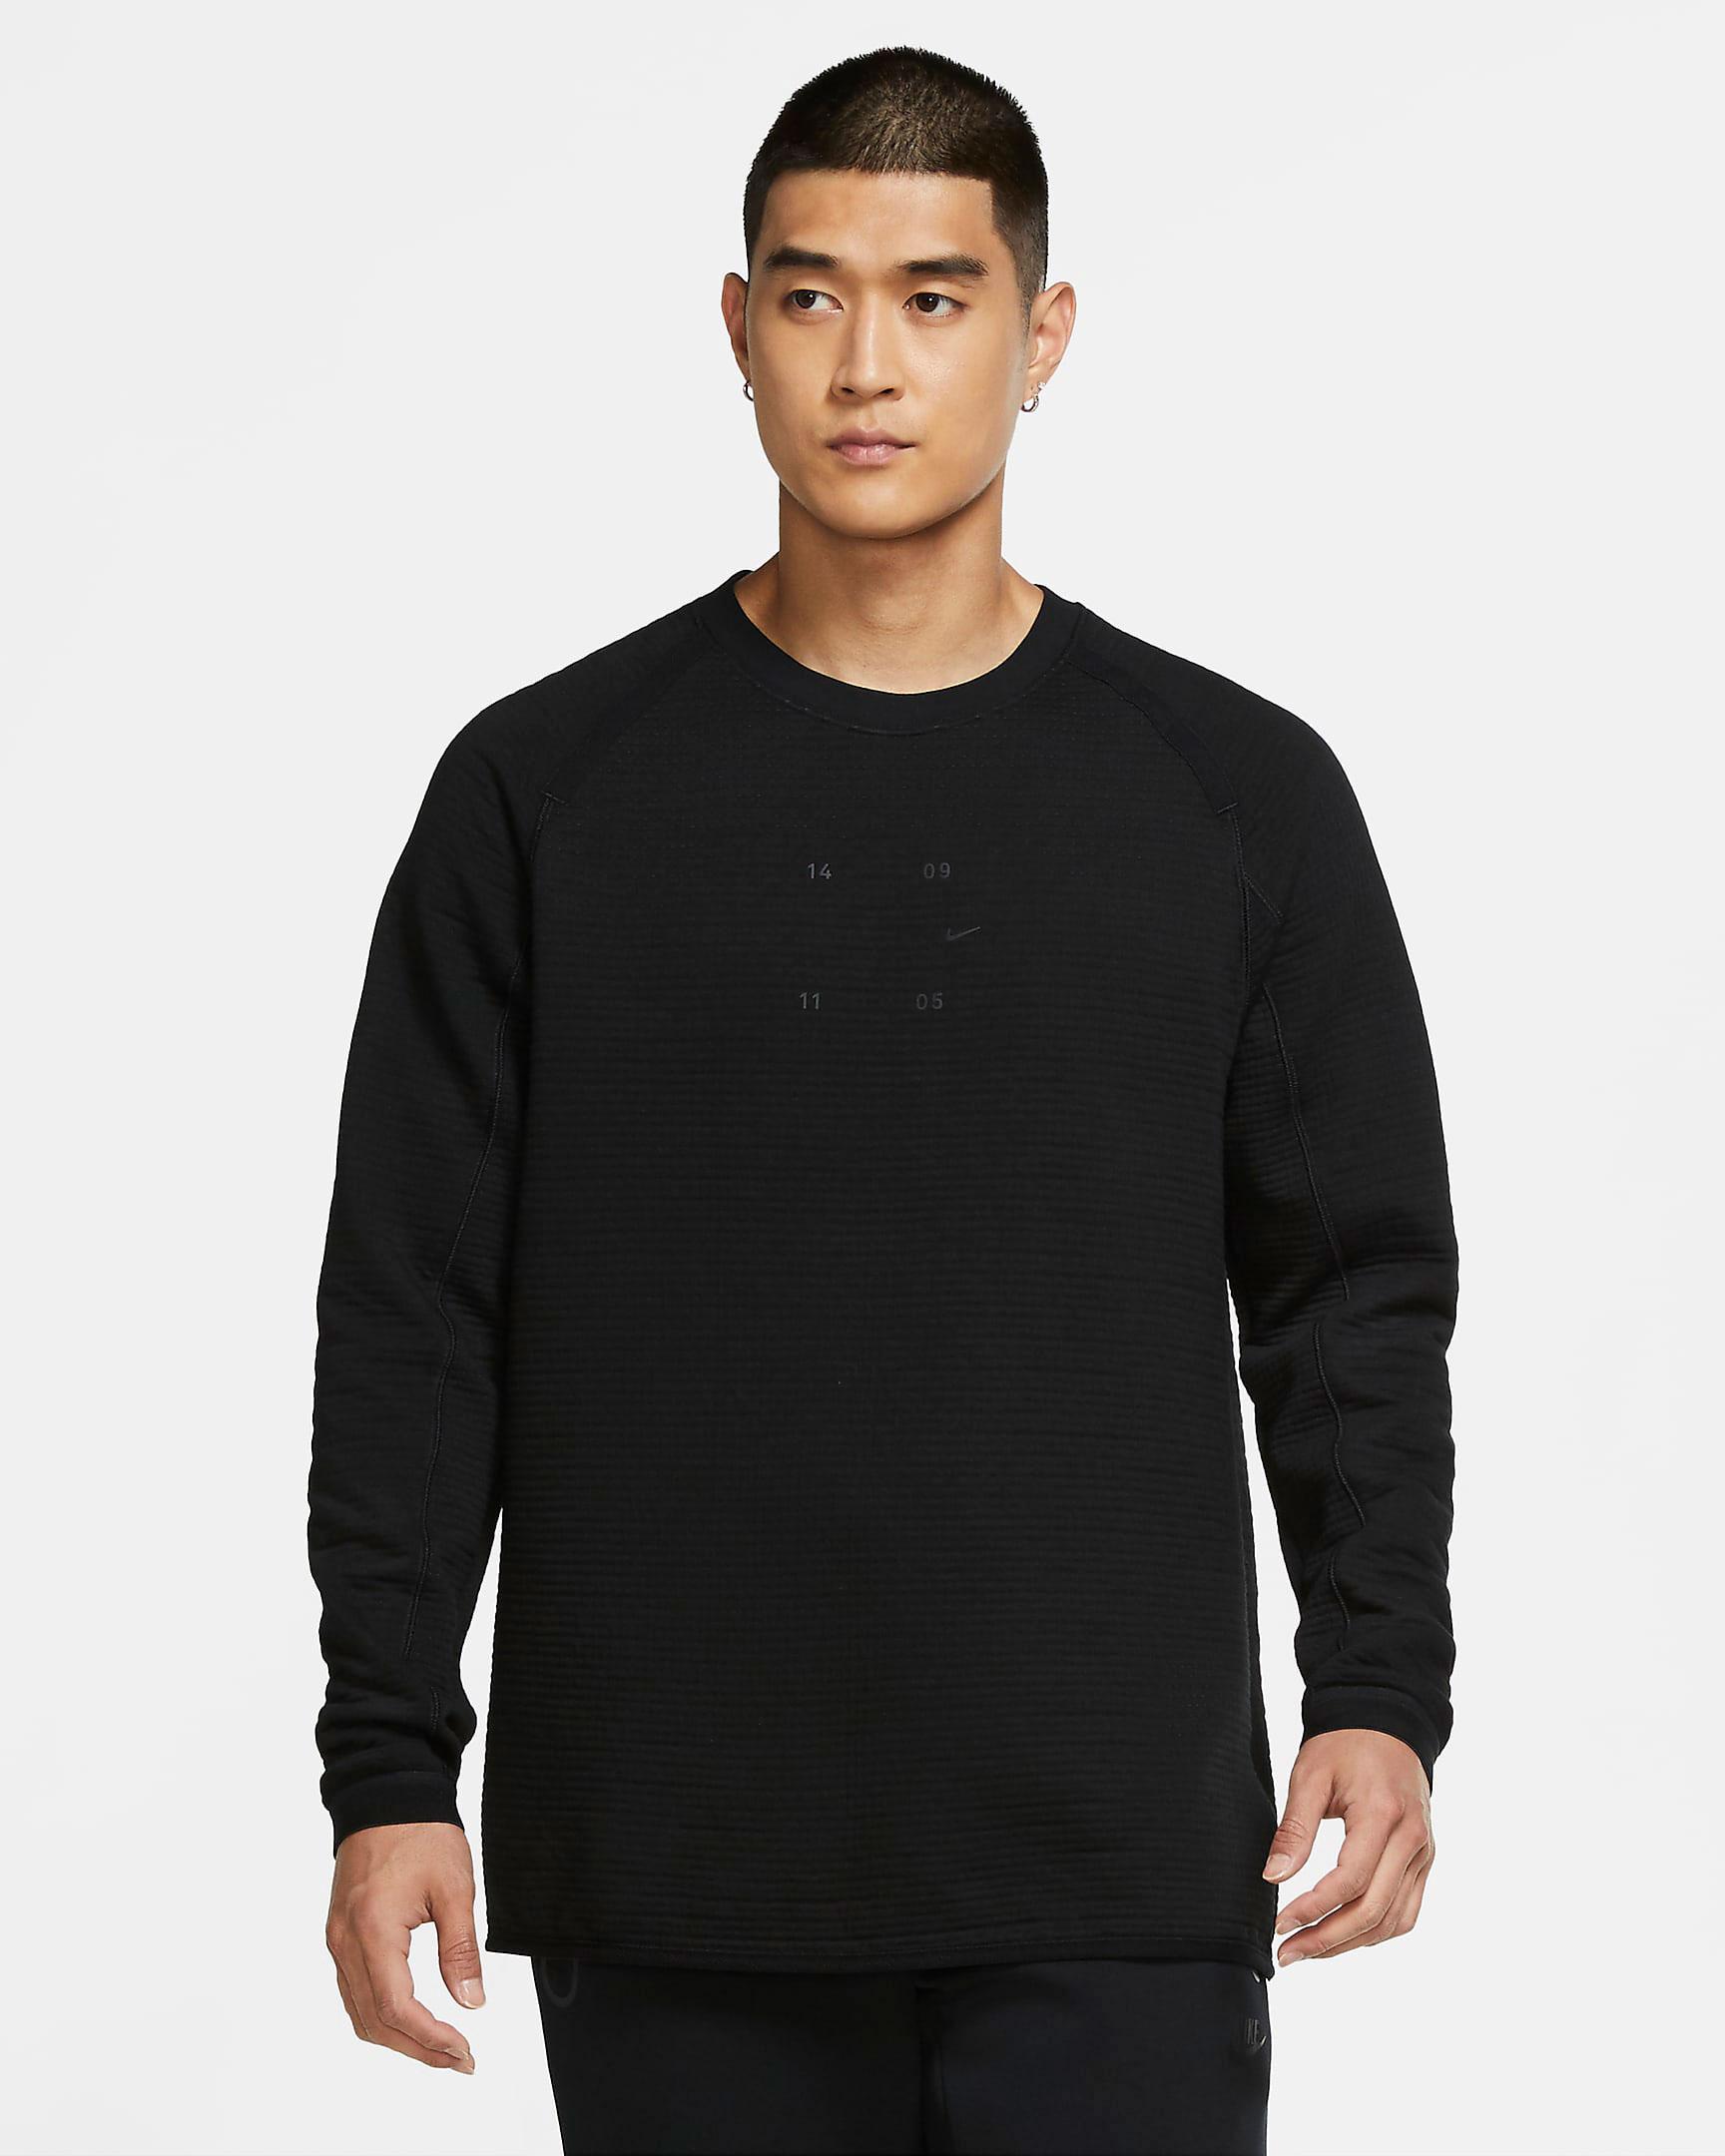 nike-adapt-auto-max-triple-black-sweatshirt